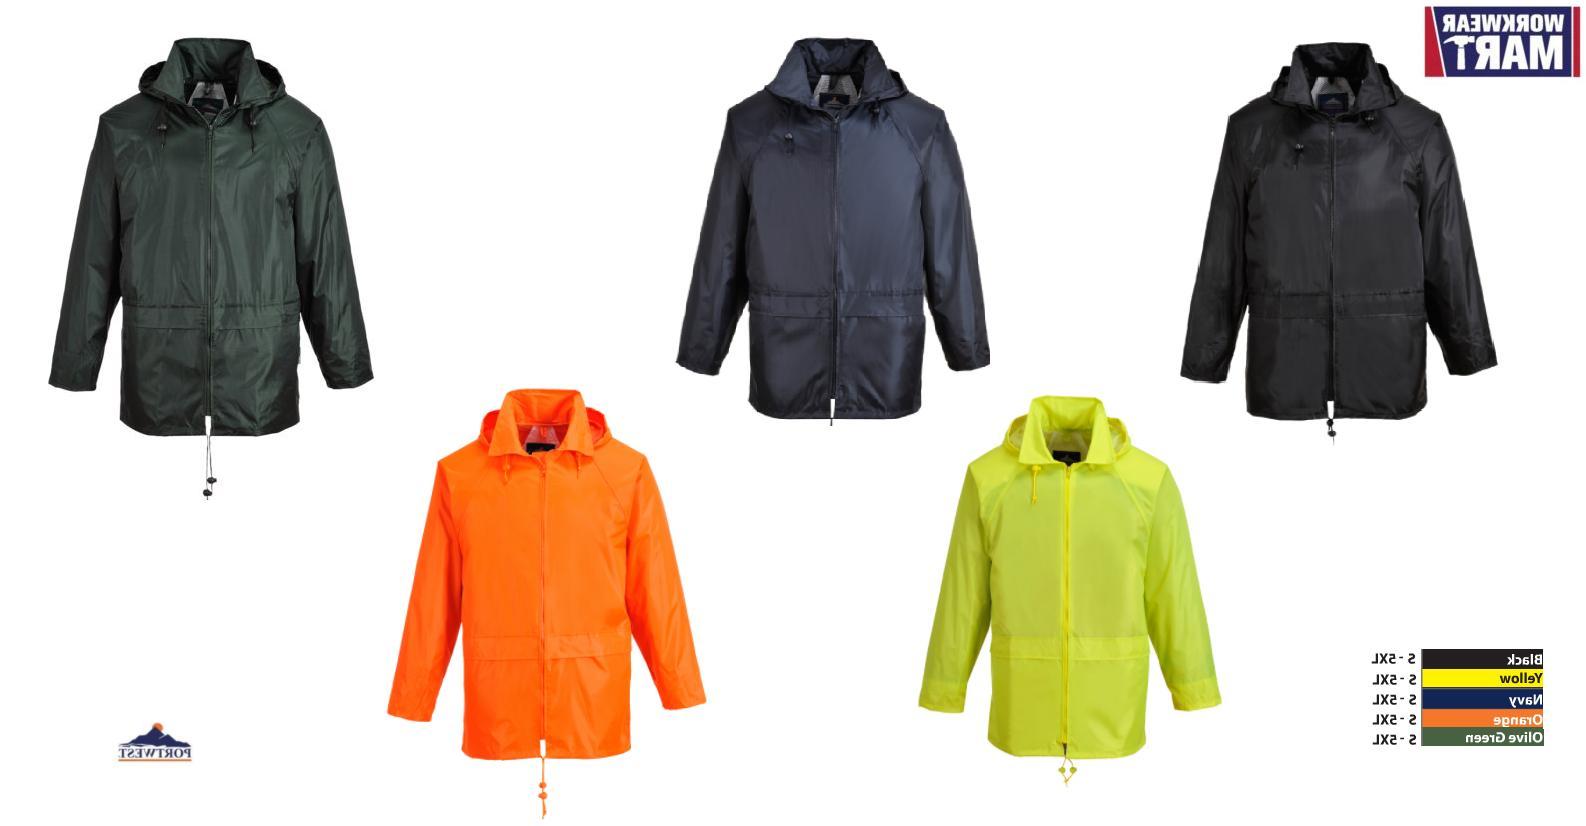 Portwest Jacket hood